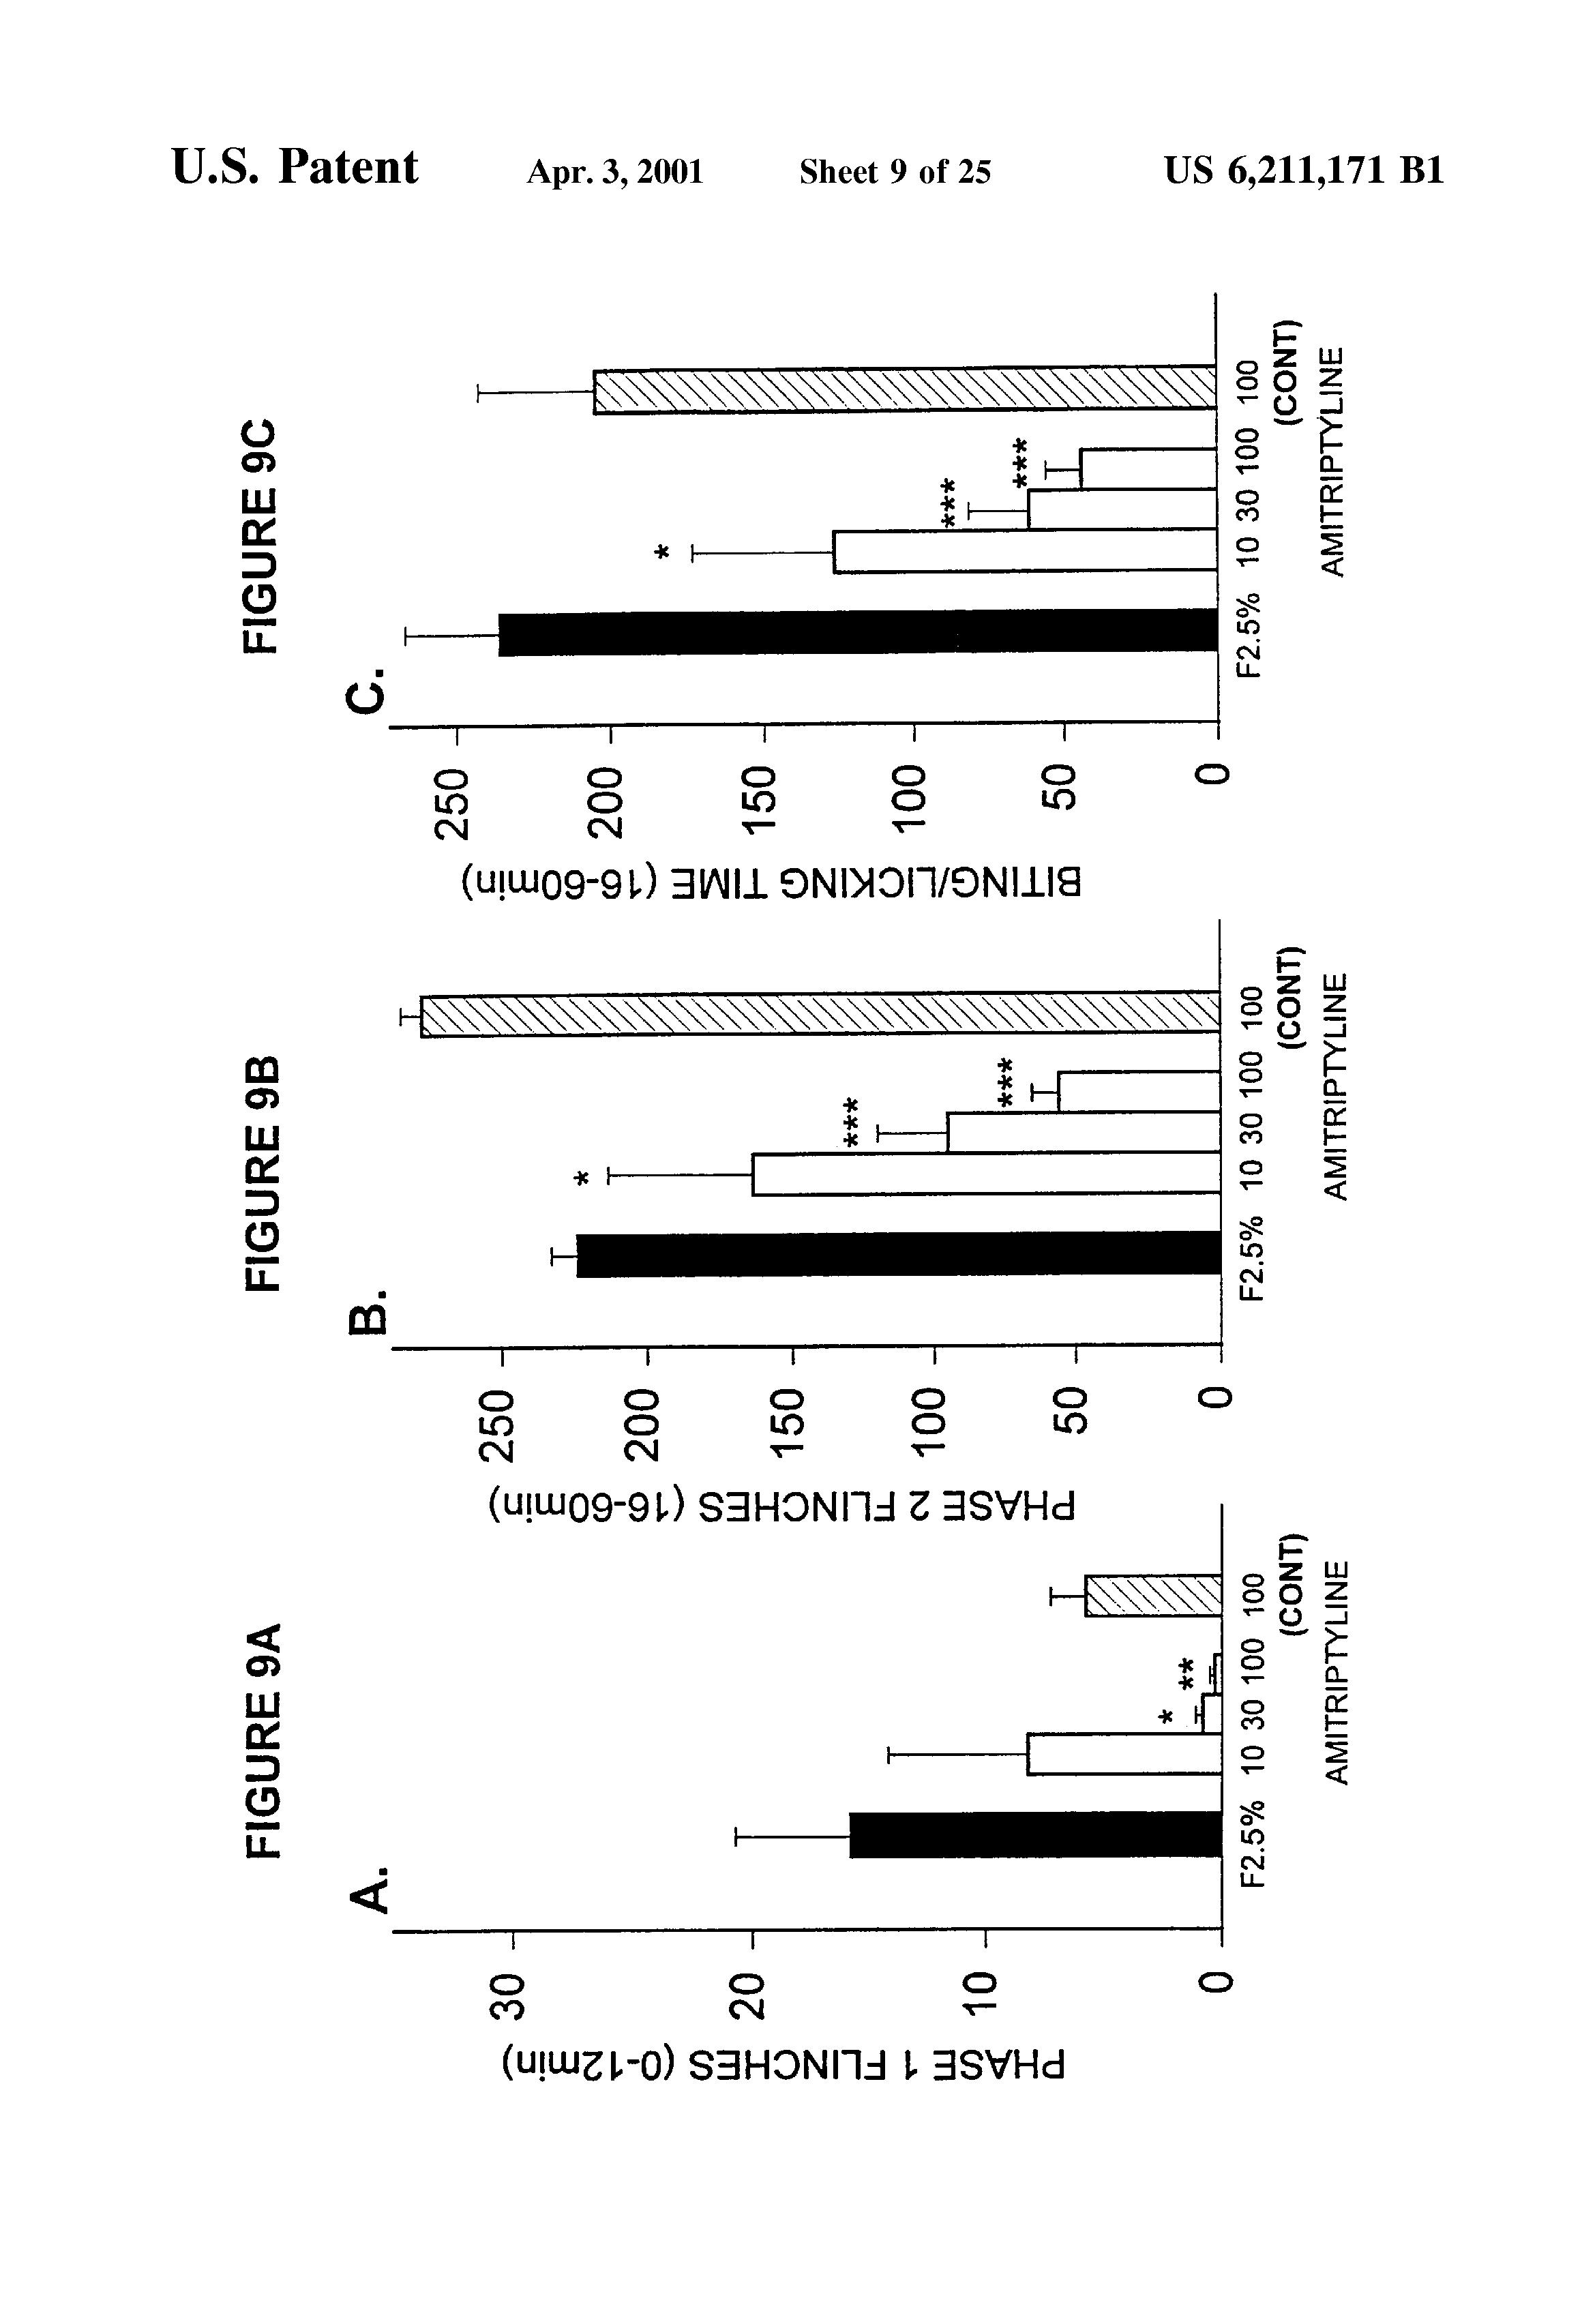 lasix side effects in humans